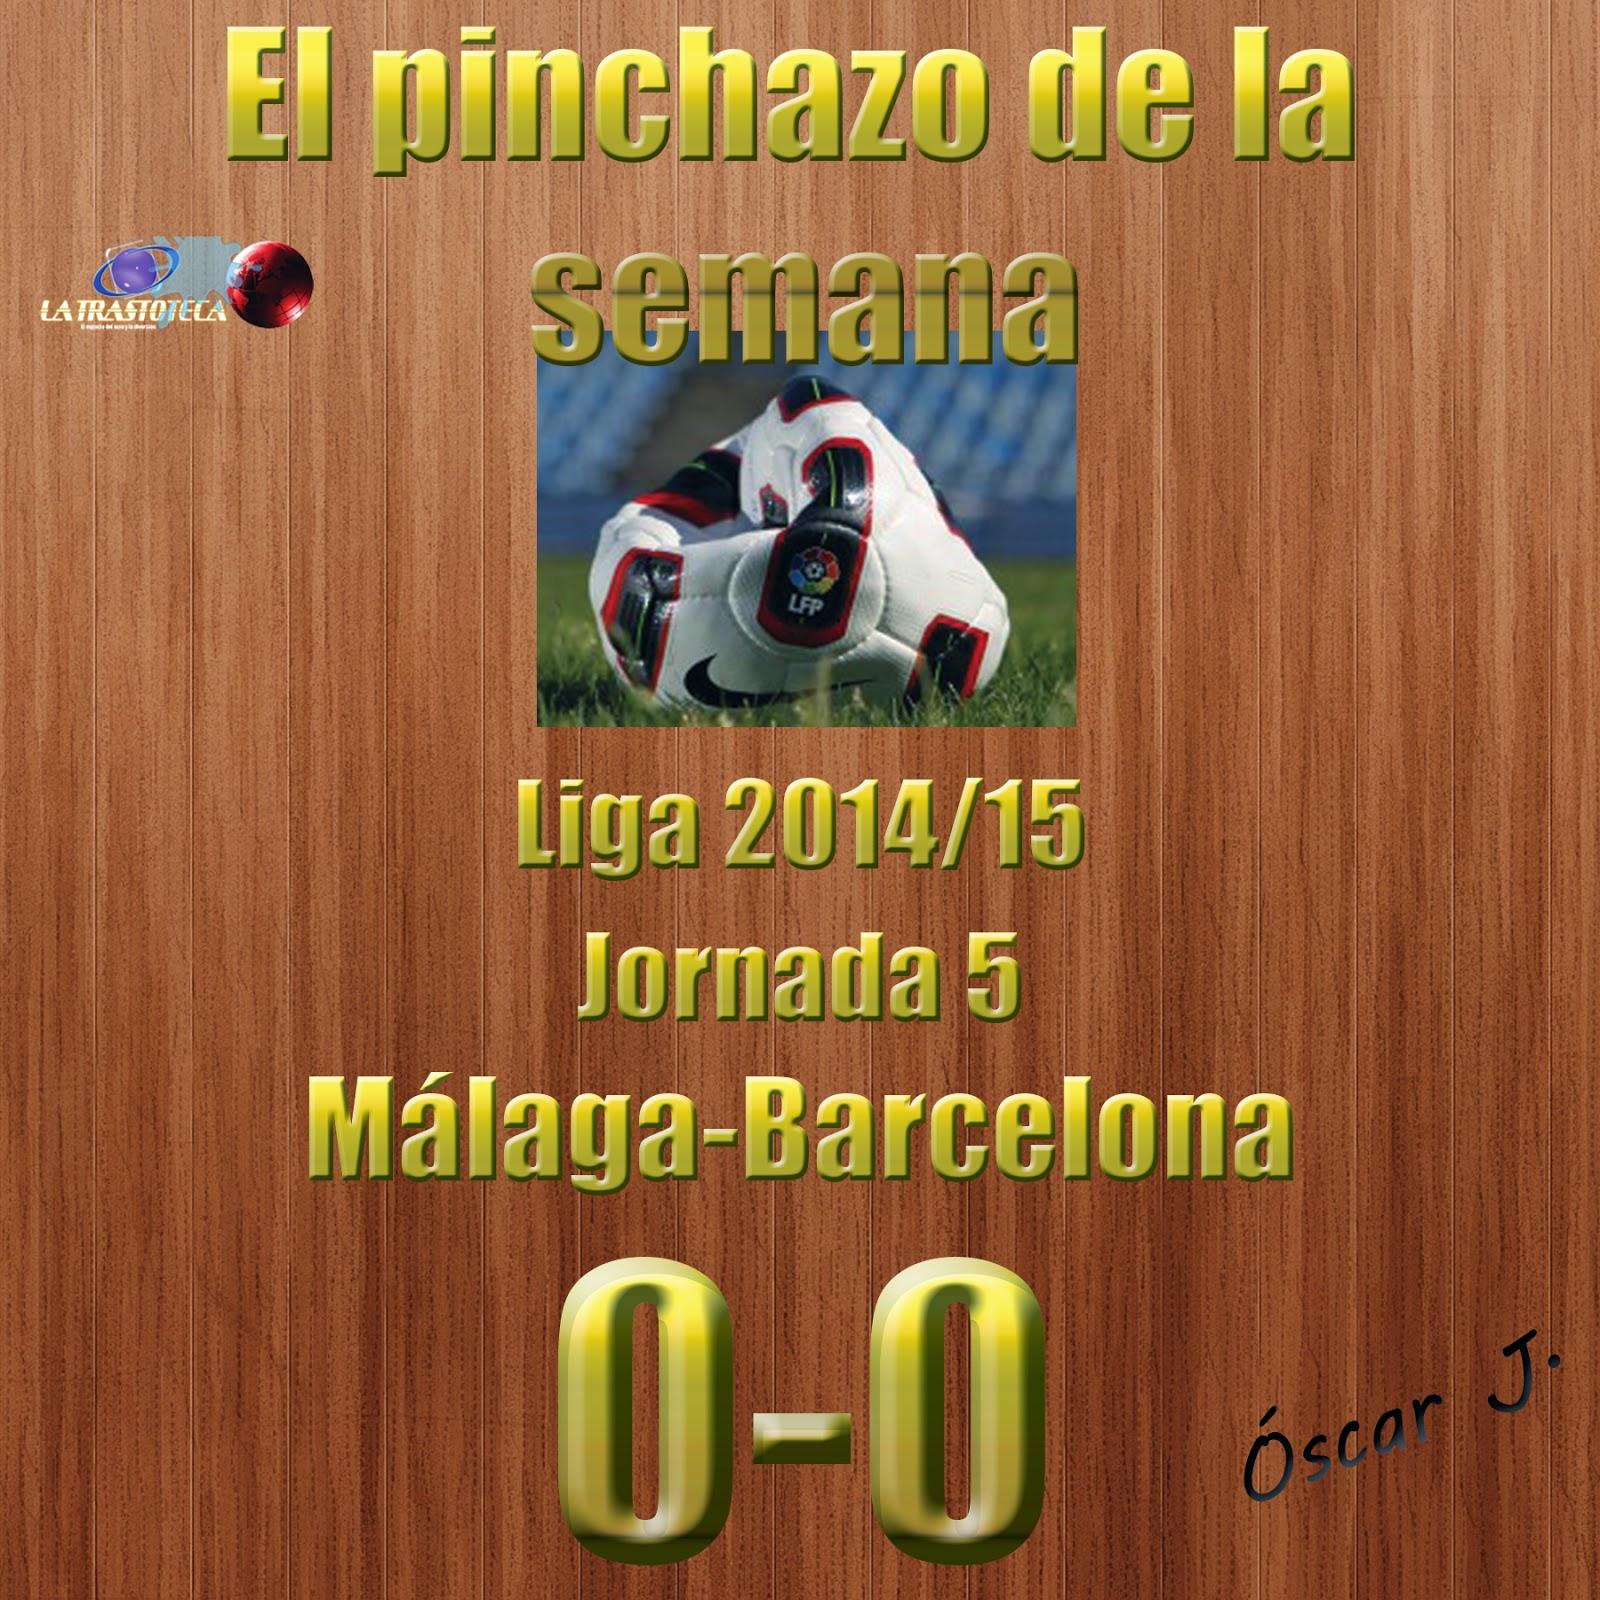 Málaga 0-0 Barcelona. Jornada 5. El pinchazo de la semana.